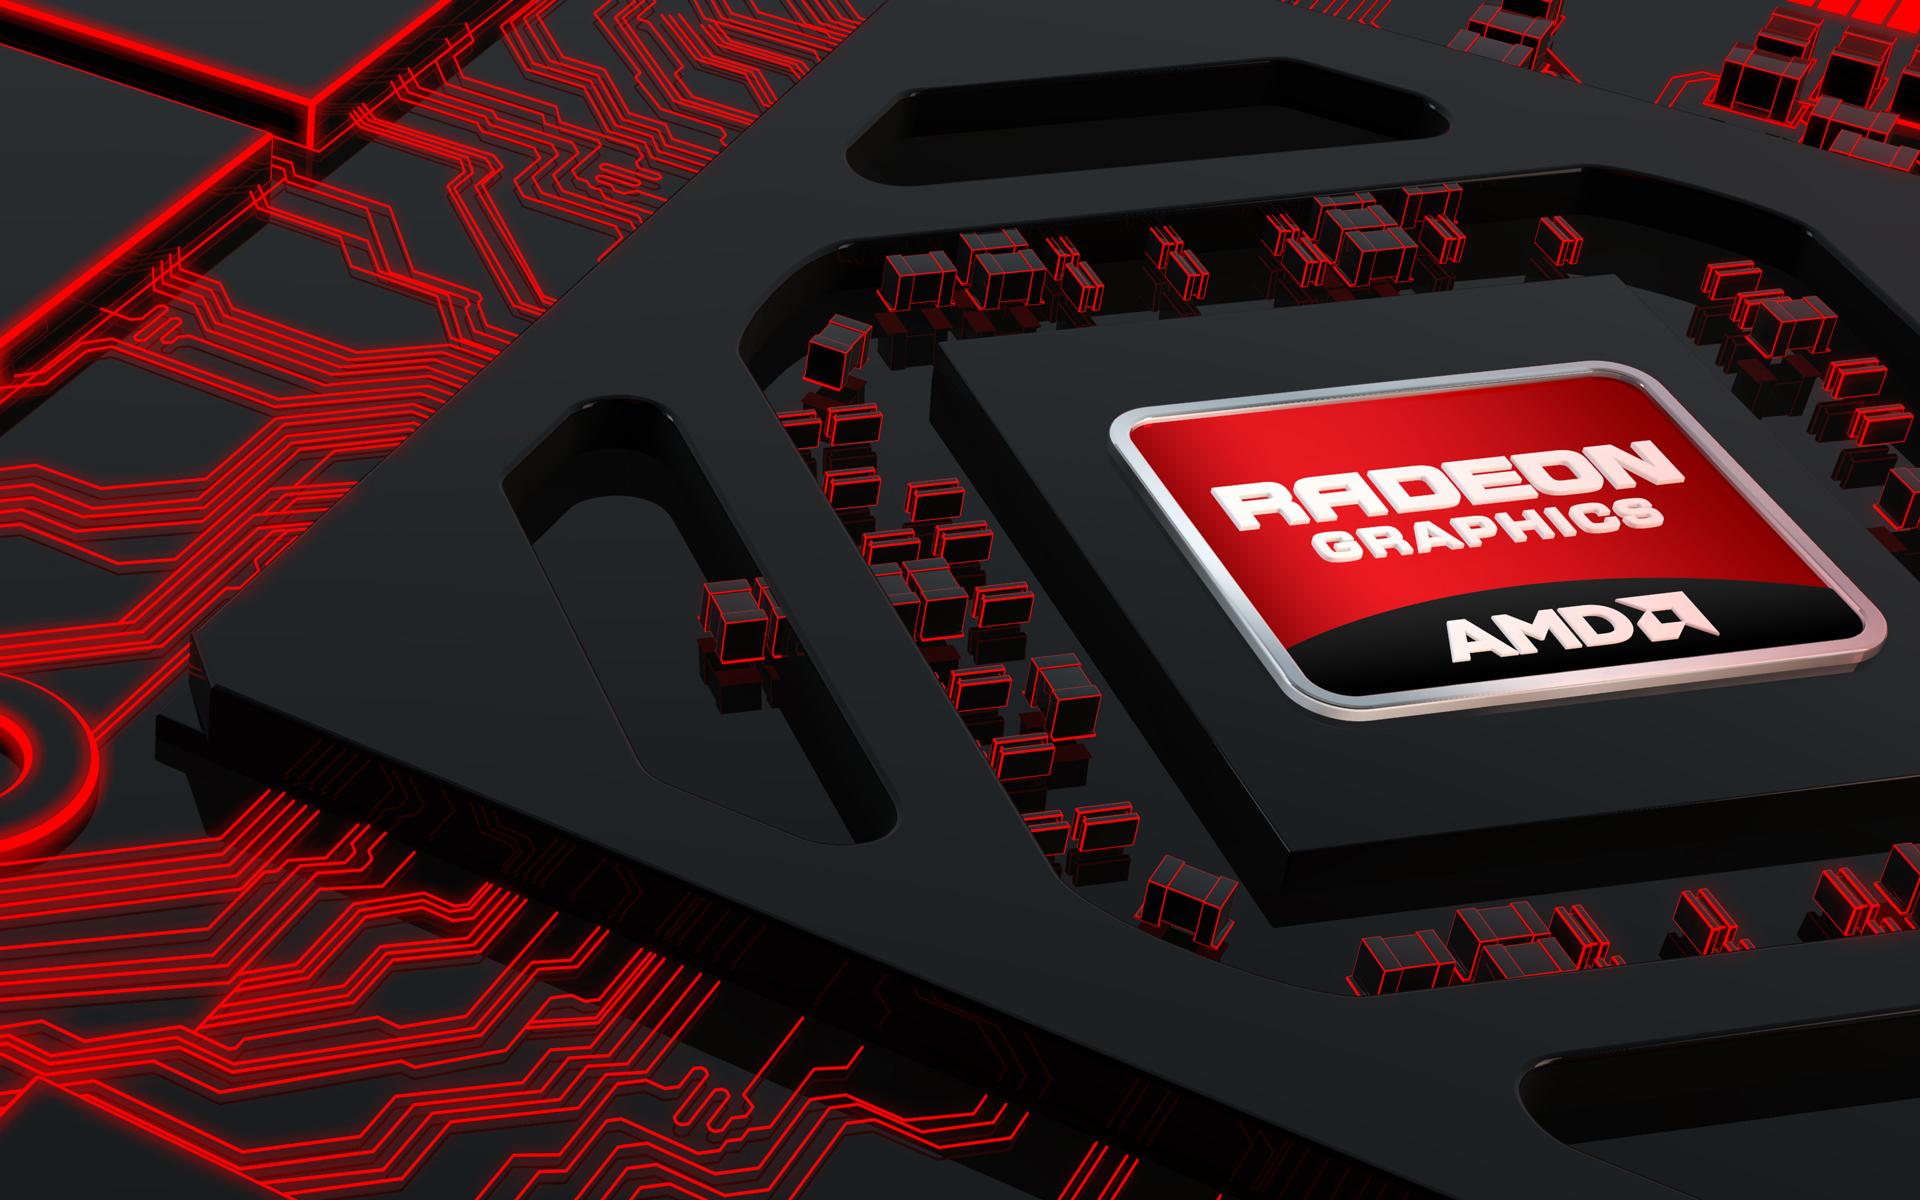 AMD accuse MediaTek, LG, Vizio et Sigma Designs d'avoir enfreint ses brevets